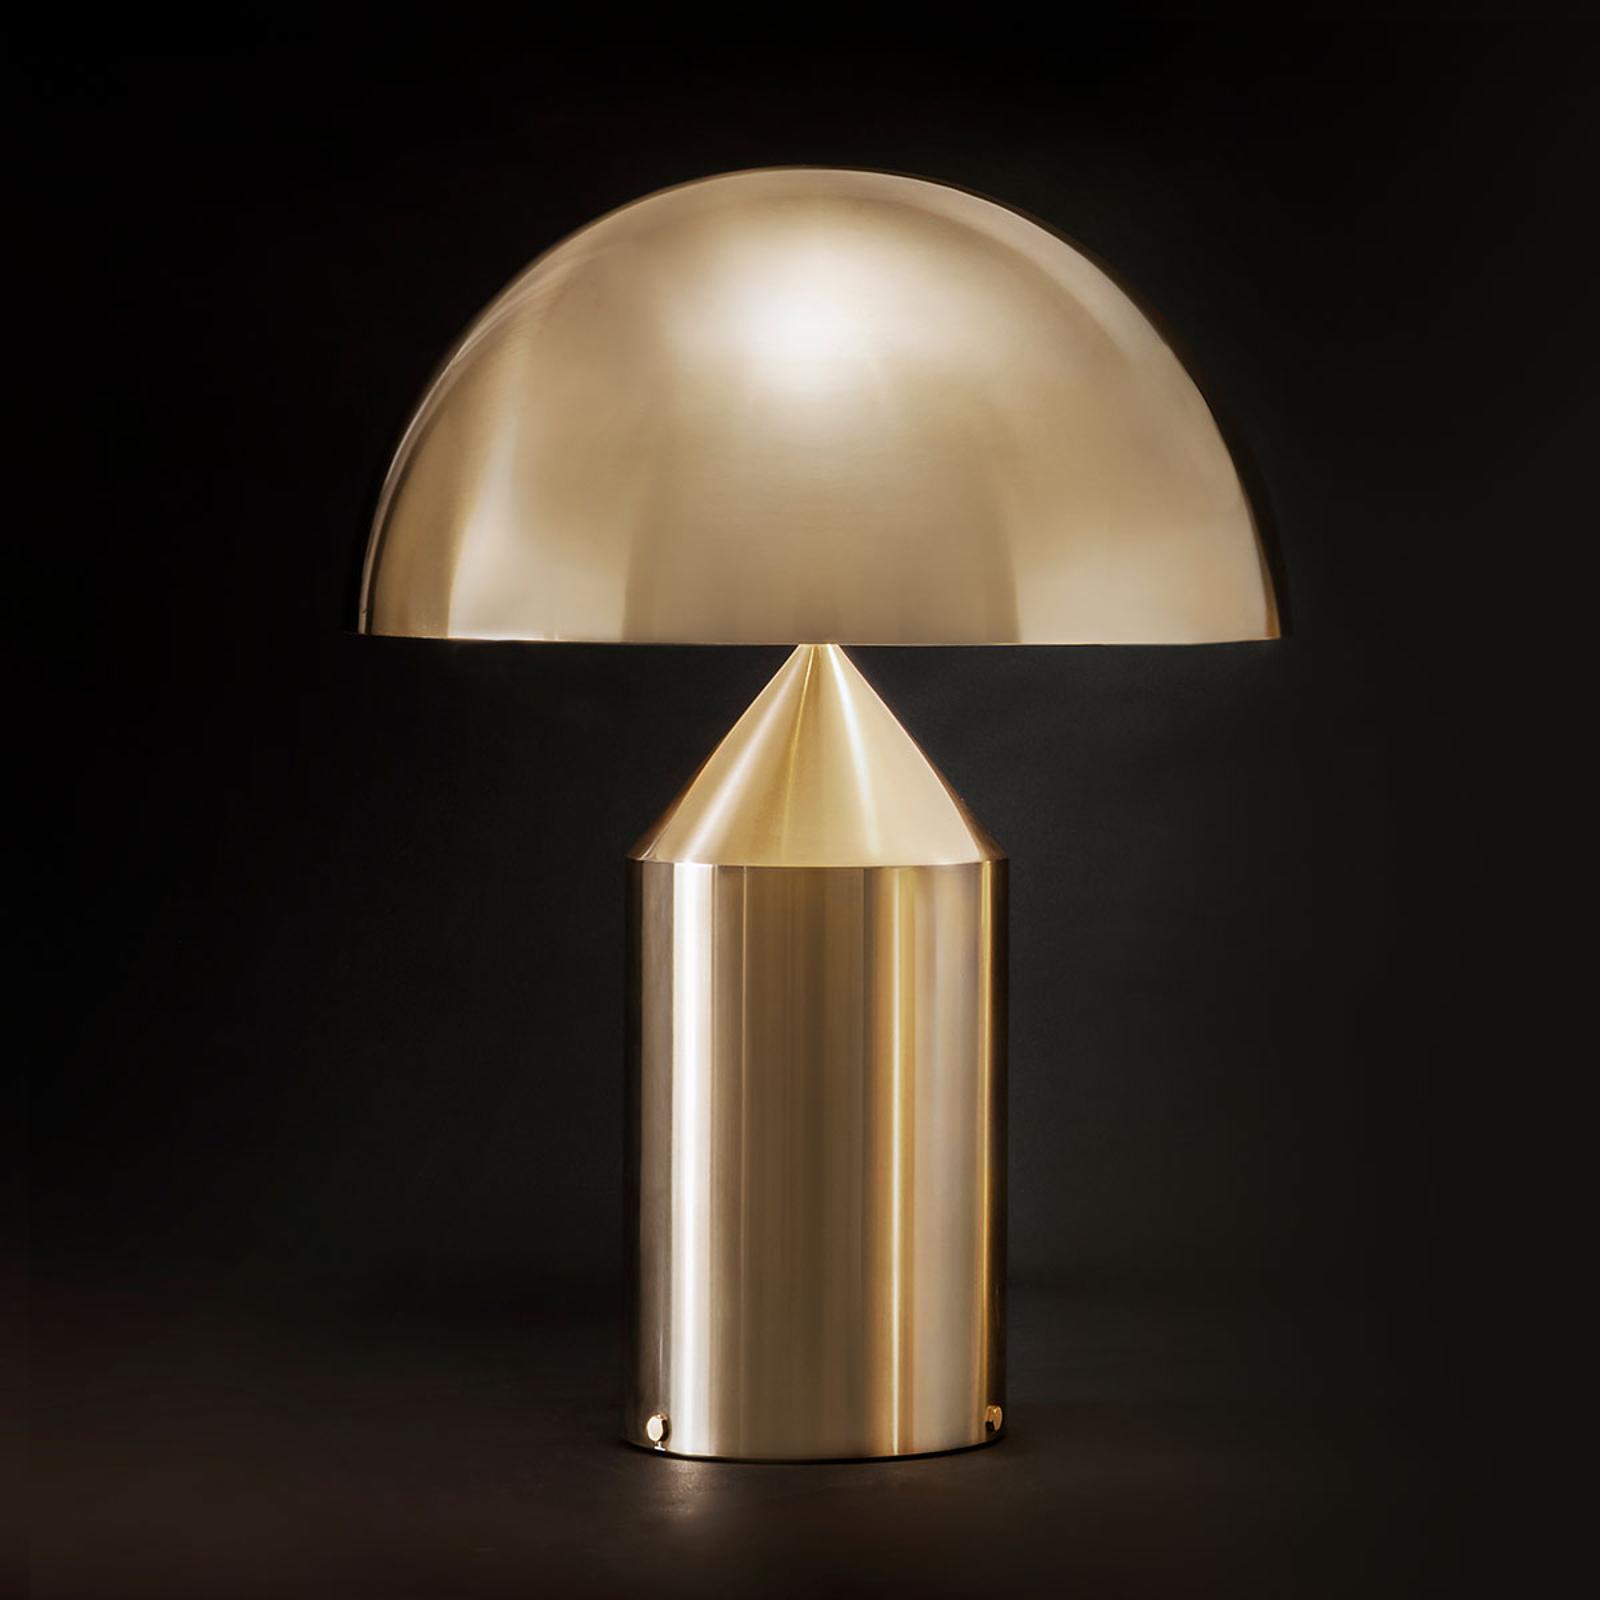 Oluce Atollo - tafellamp met dimmer, goud